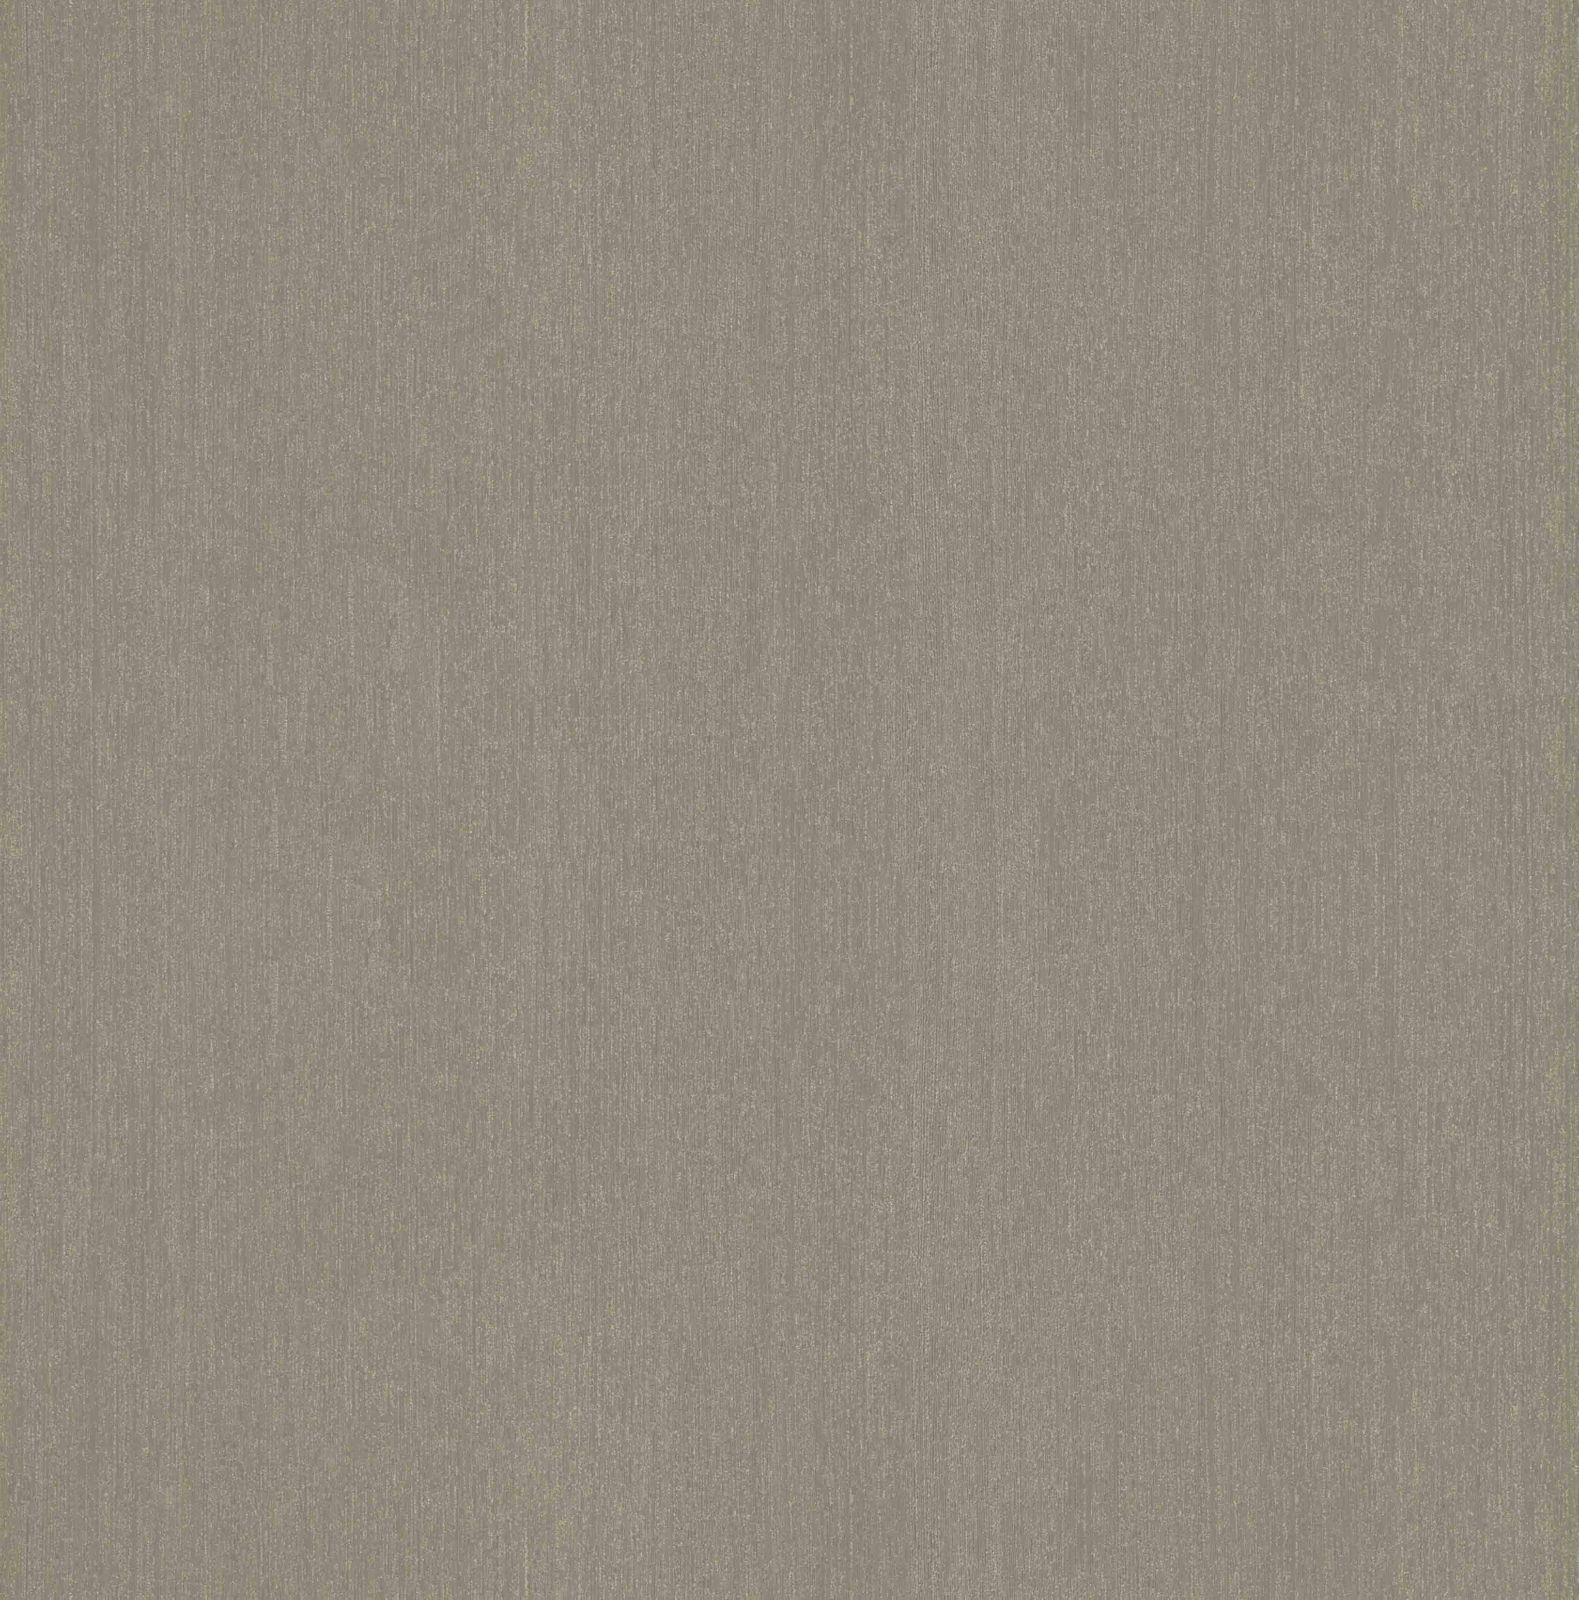 Tapete Colani Evolution Marburg Uni Silber 56348